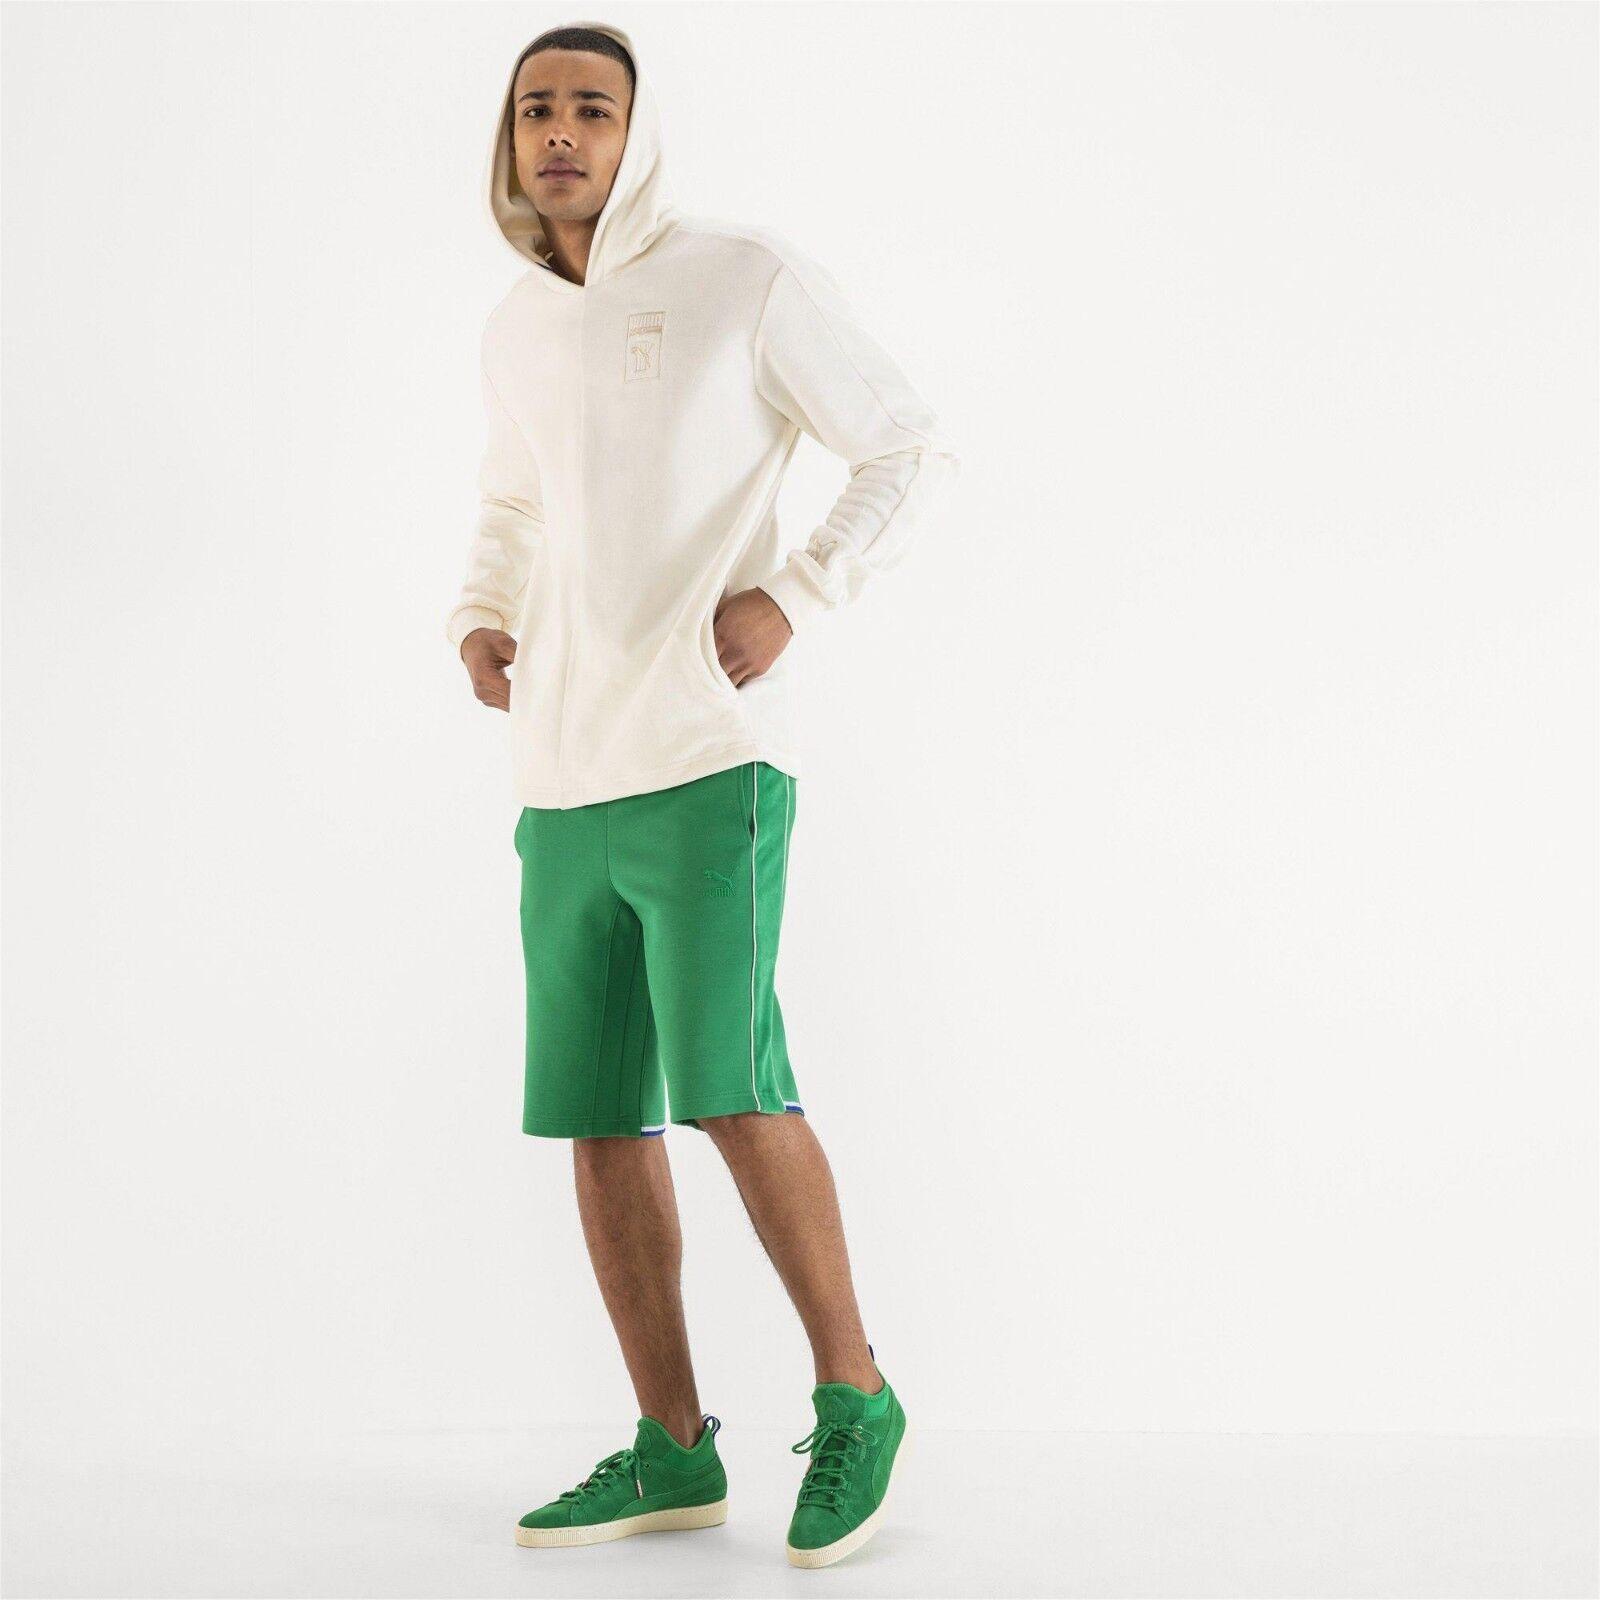 Puma X Men's Big Sean Jelly Bean Warm Up Sweat Shorts XL Save 30%